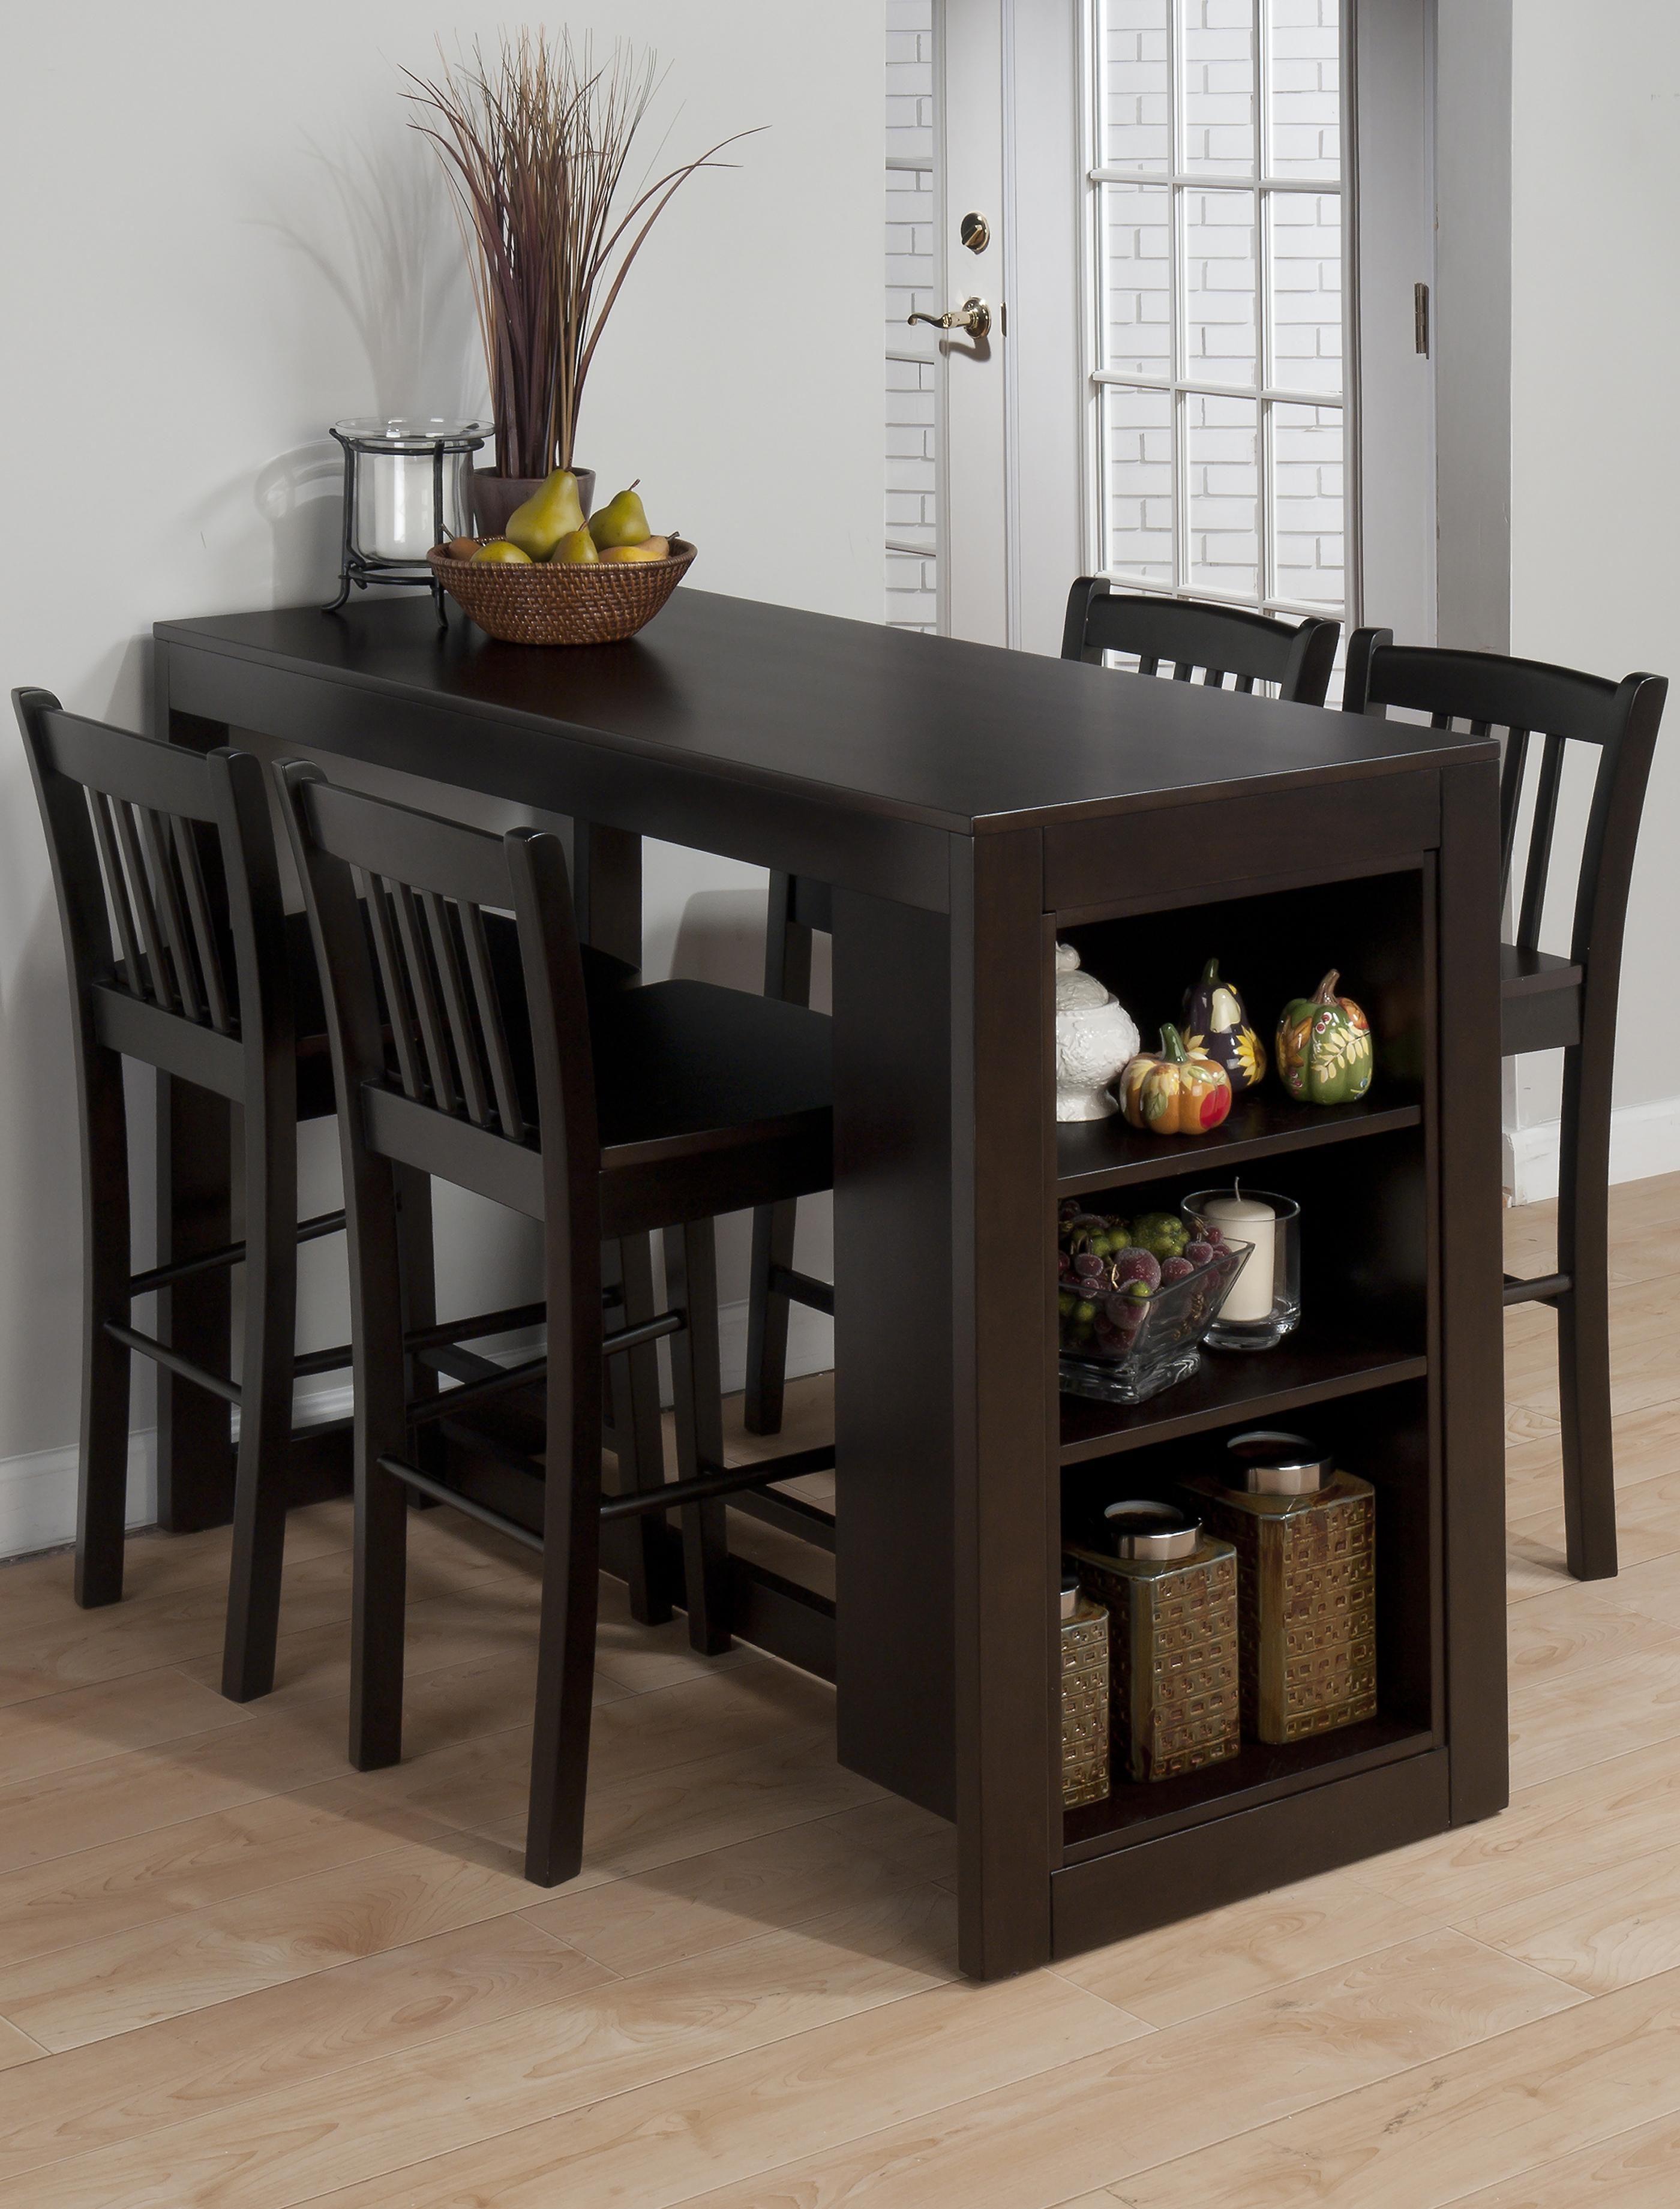 Qualität esszimmer sets maryland merlot slat back counter height stool with stretchers